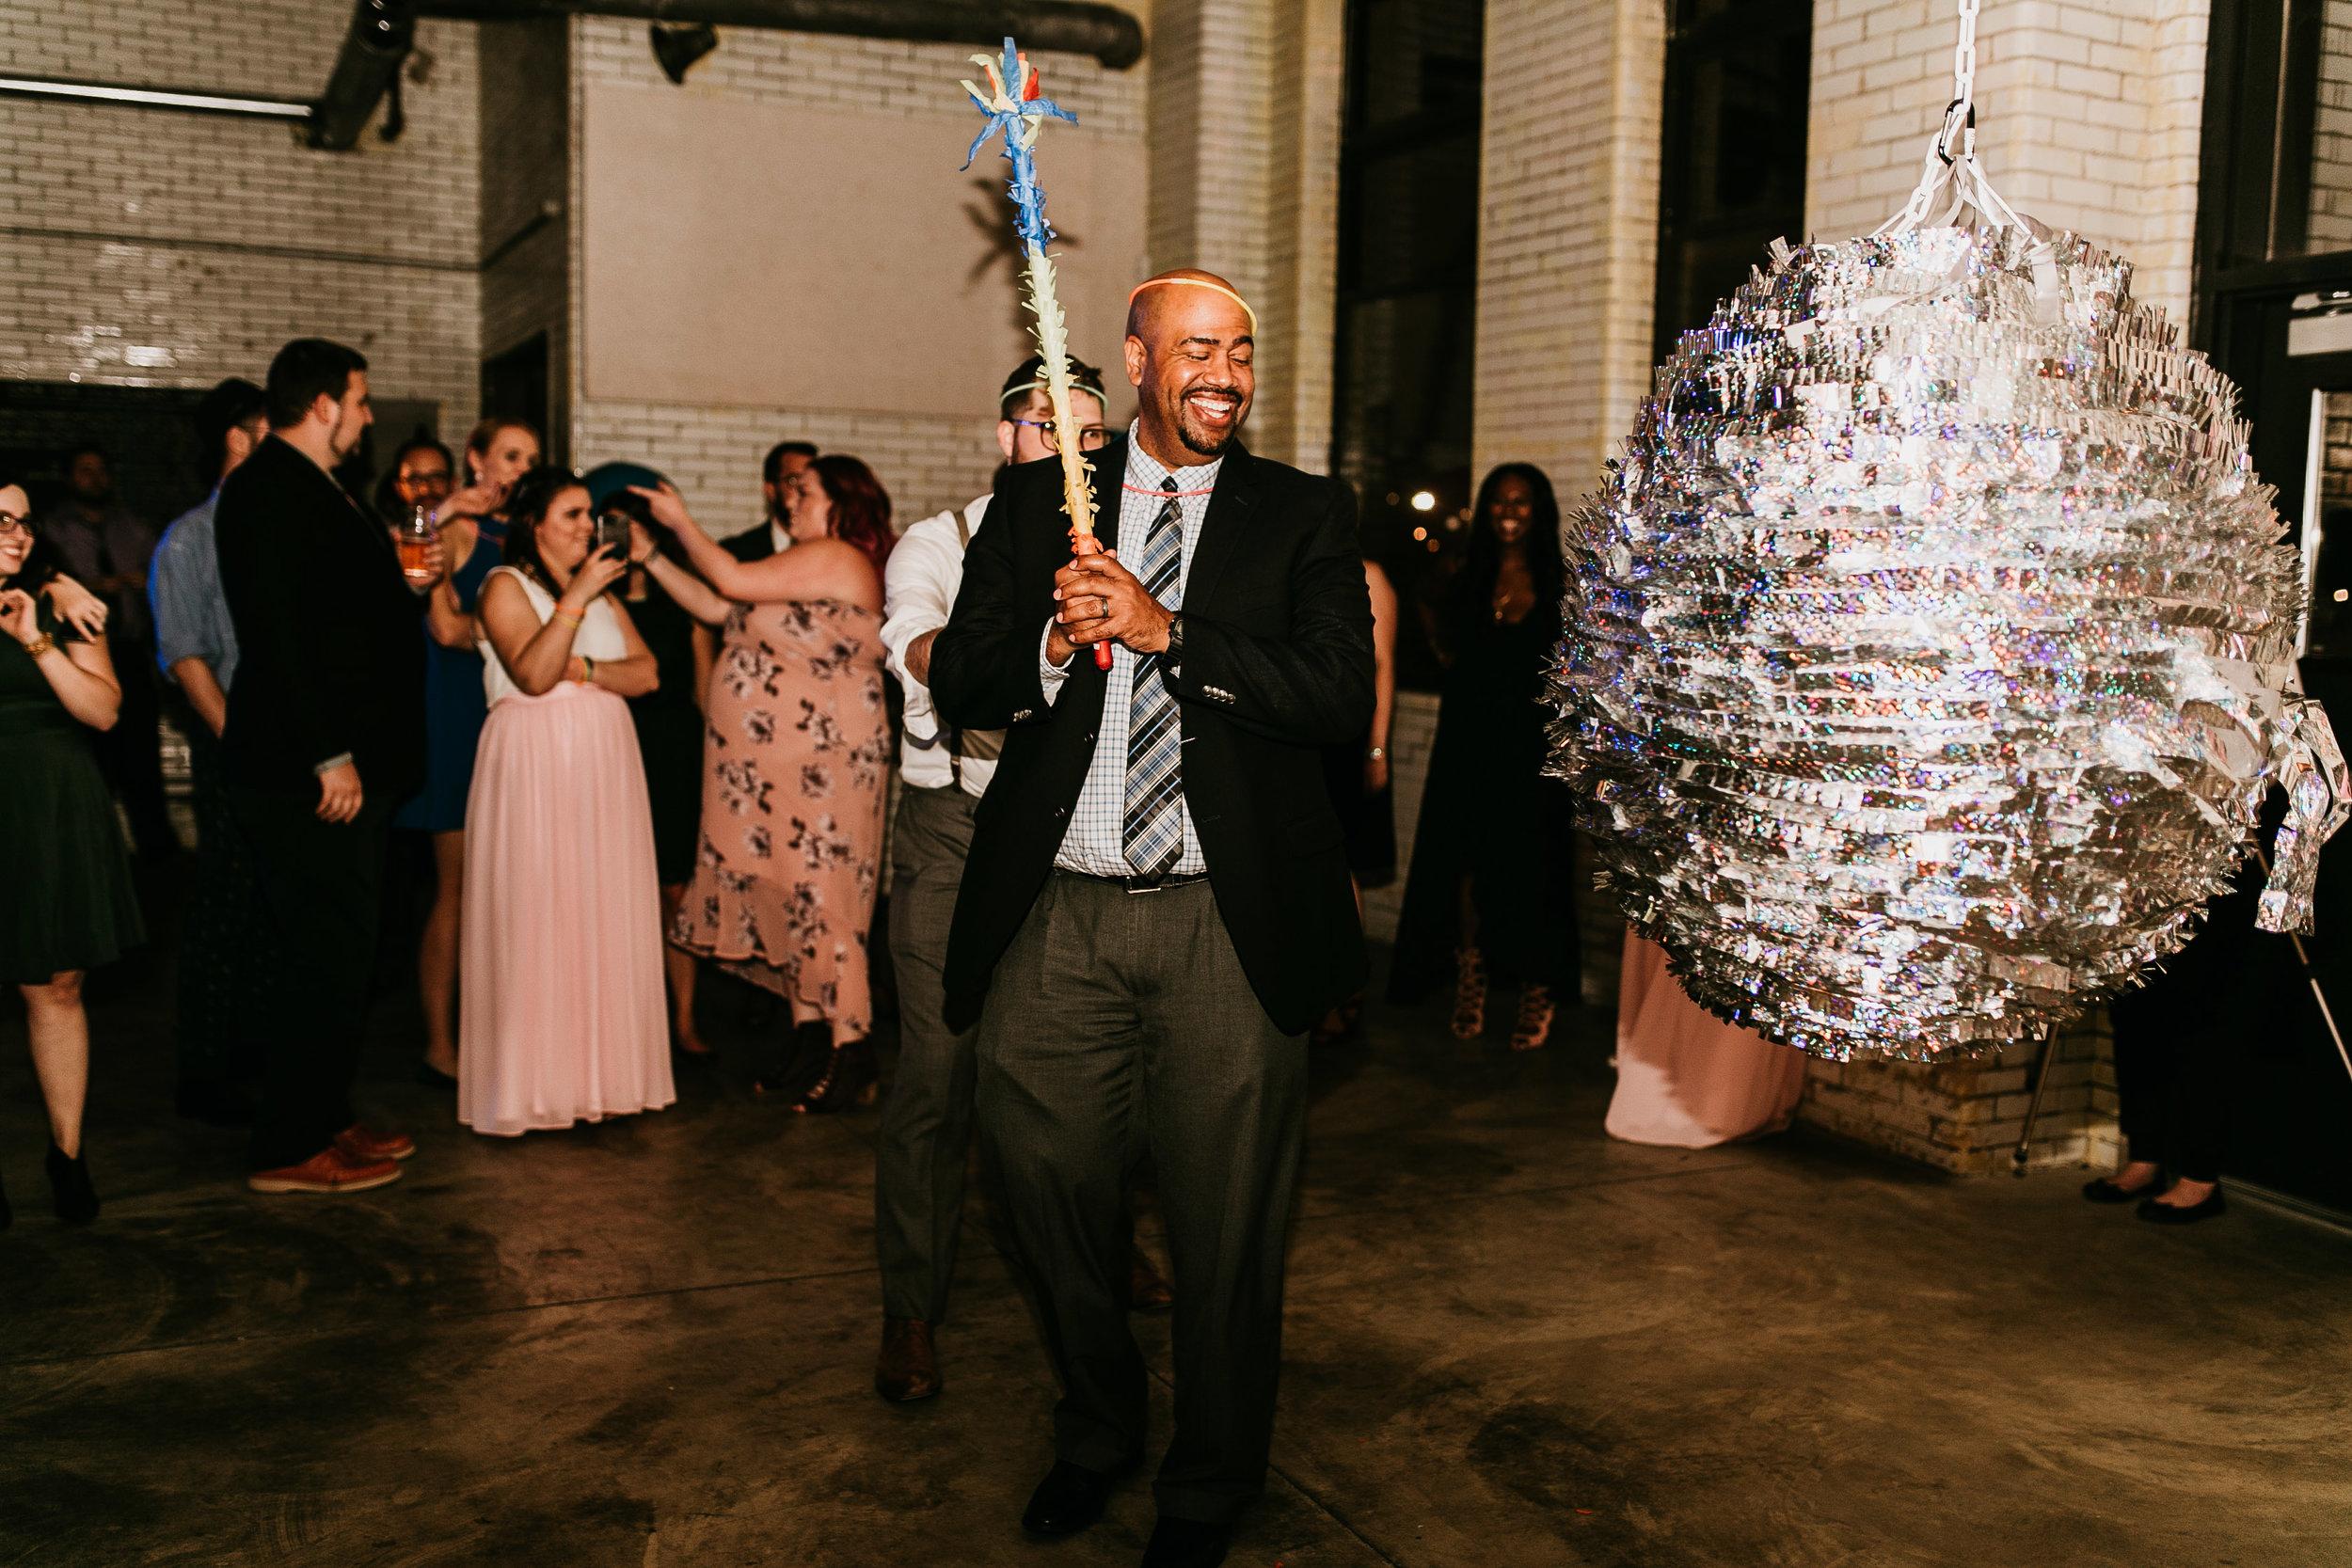 uprooted-traveler-traditional-vs-vegas-wedding-disco-pinata-vegan.jpg